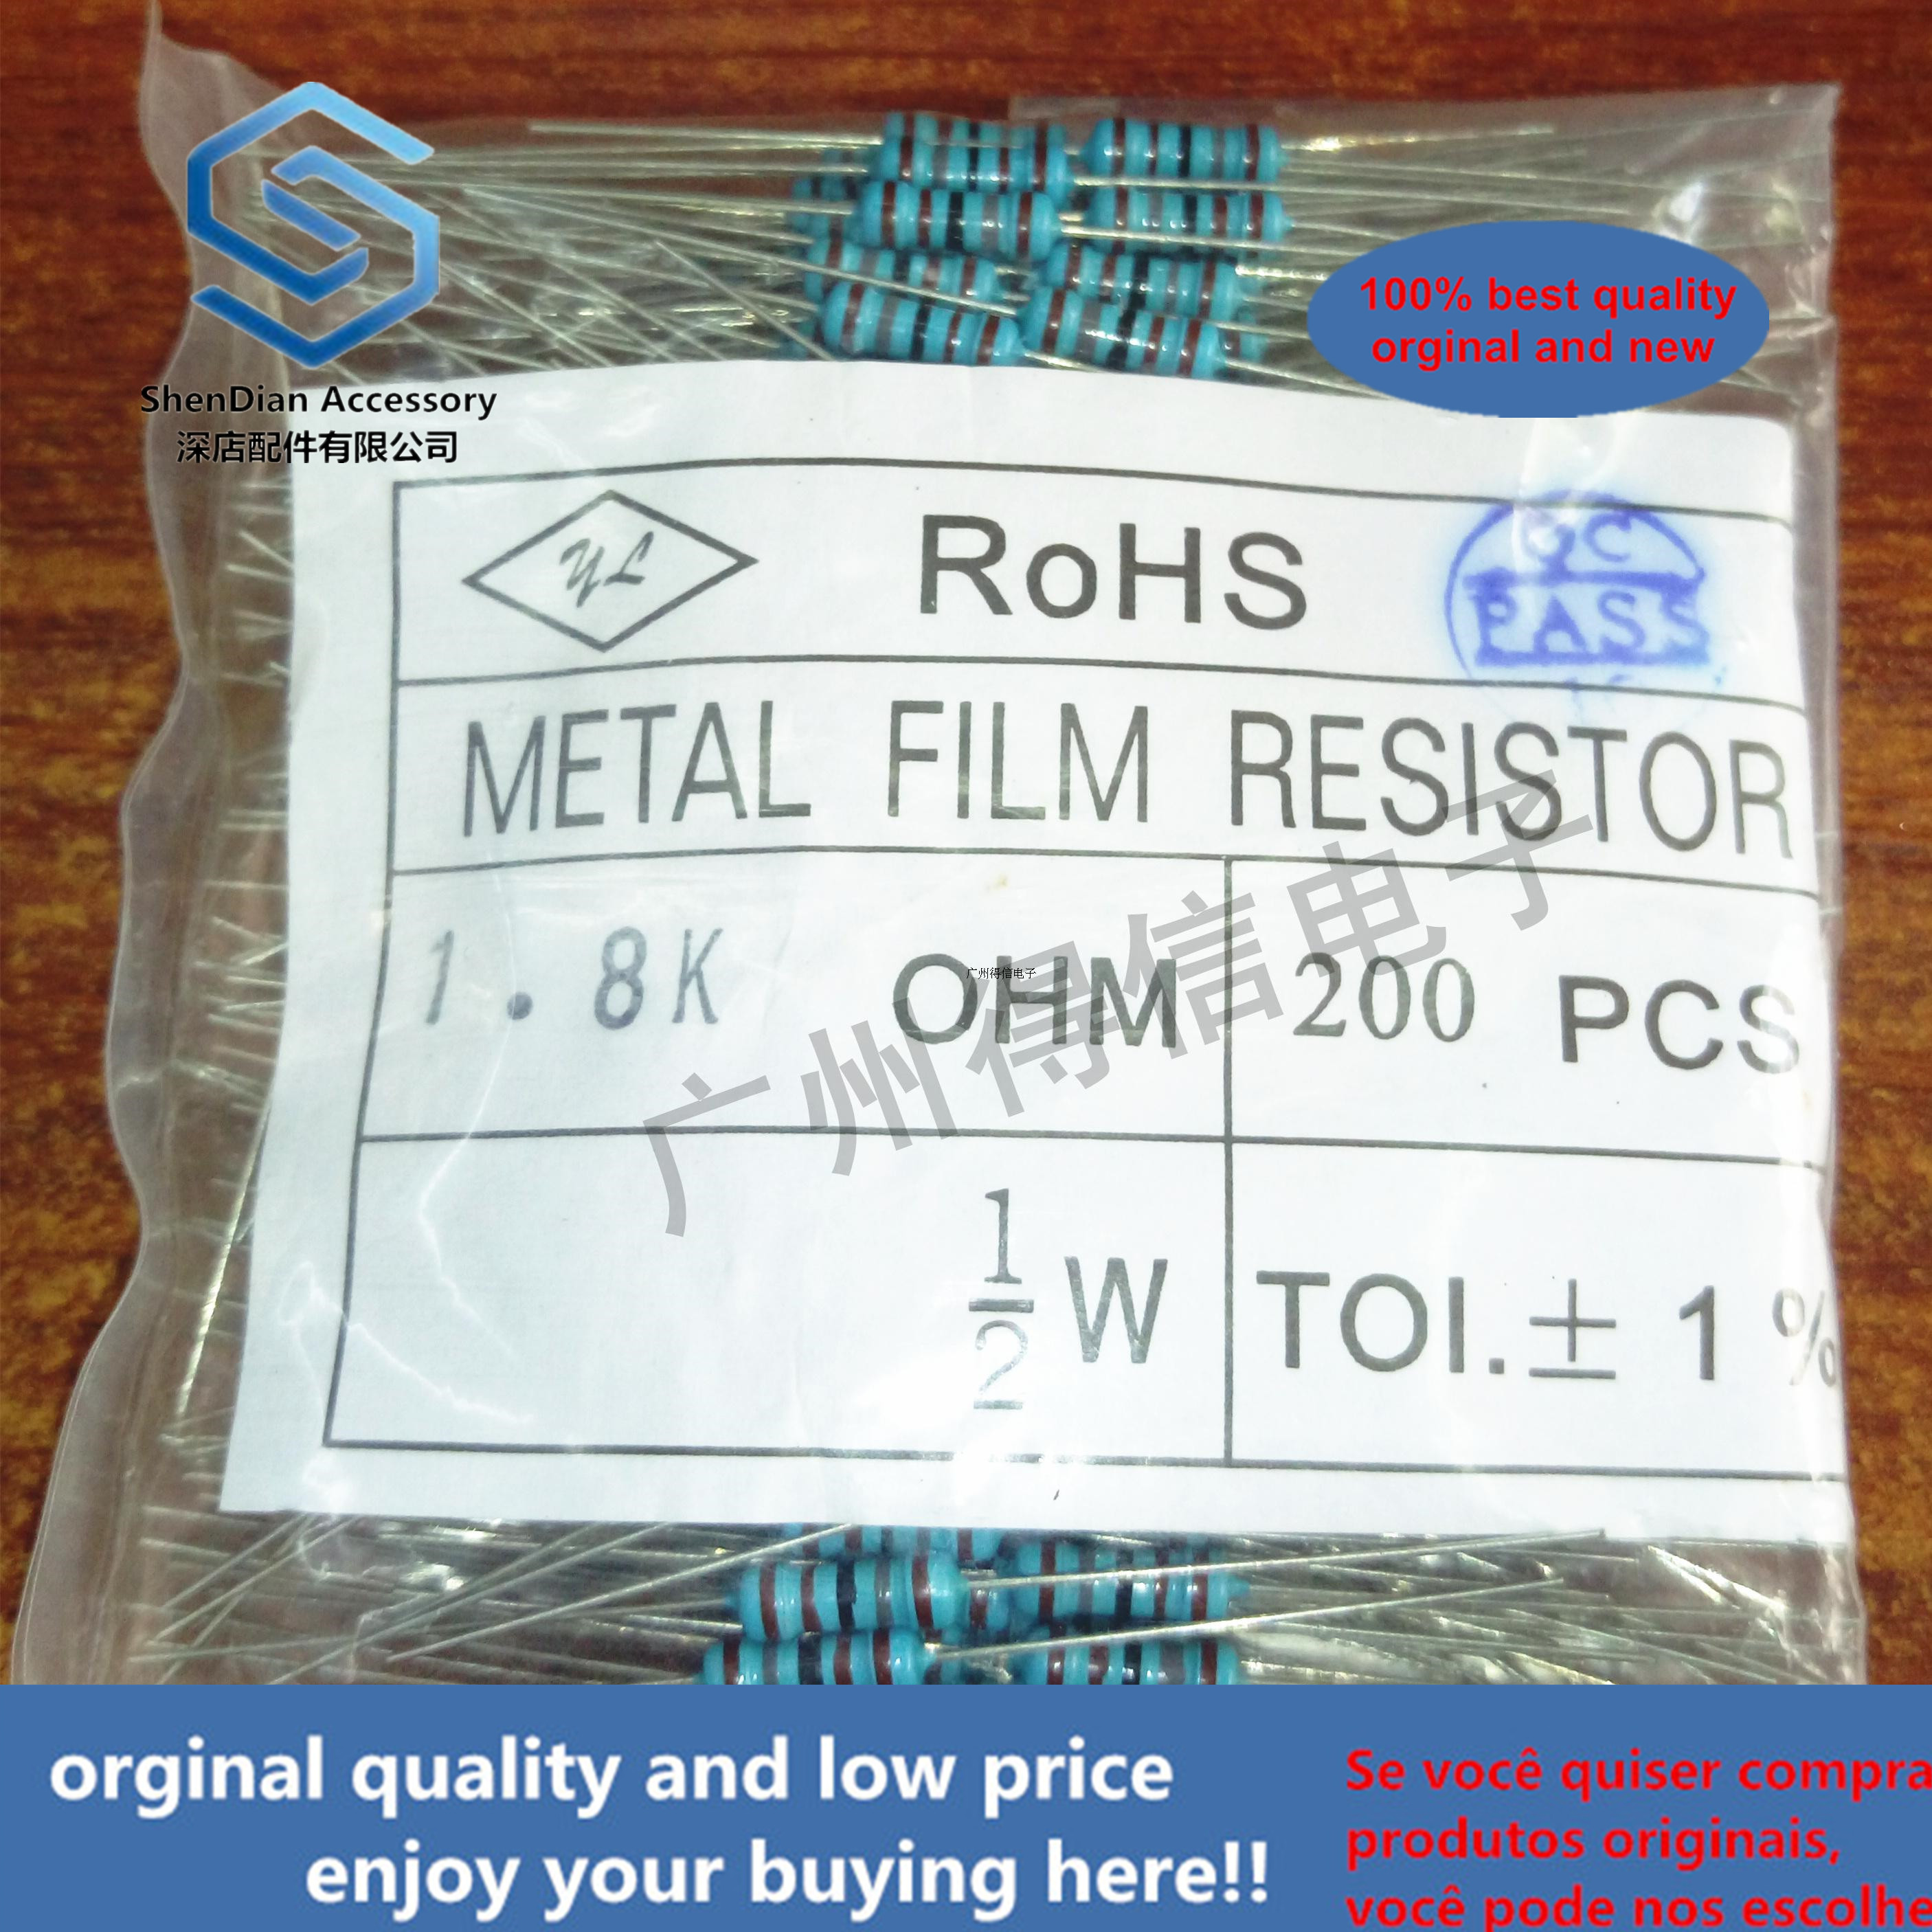 200pcs 1 / 2W 18R 18Euro 1% Brand New Metal Film Iron Feet Resistance Bag 200pcs Per Pack